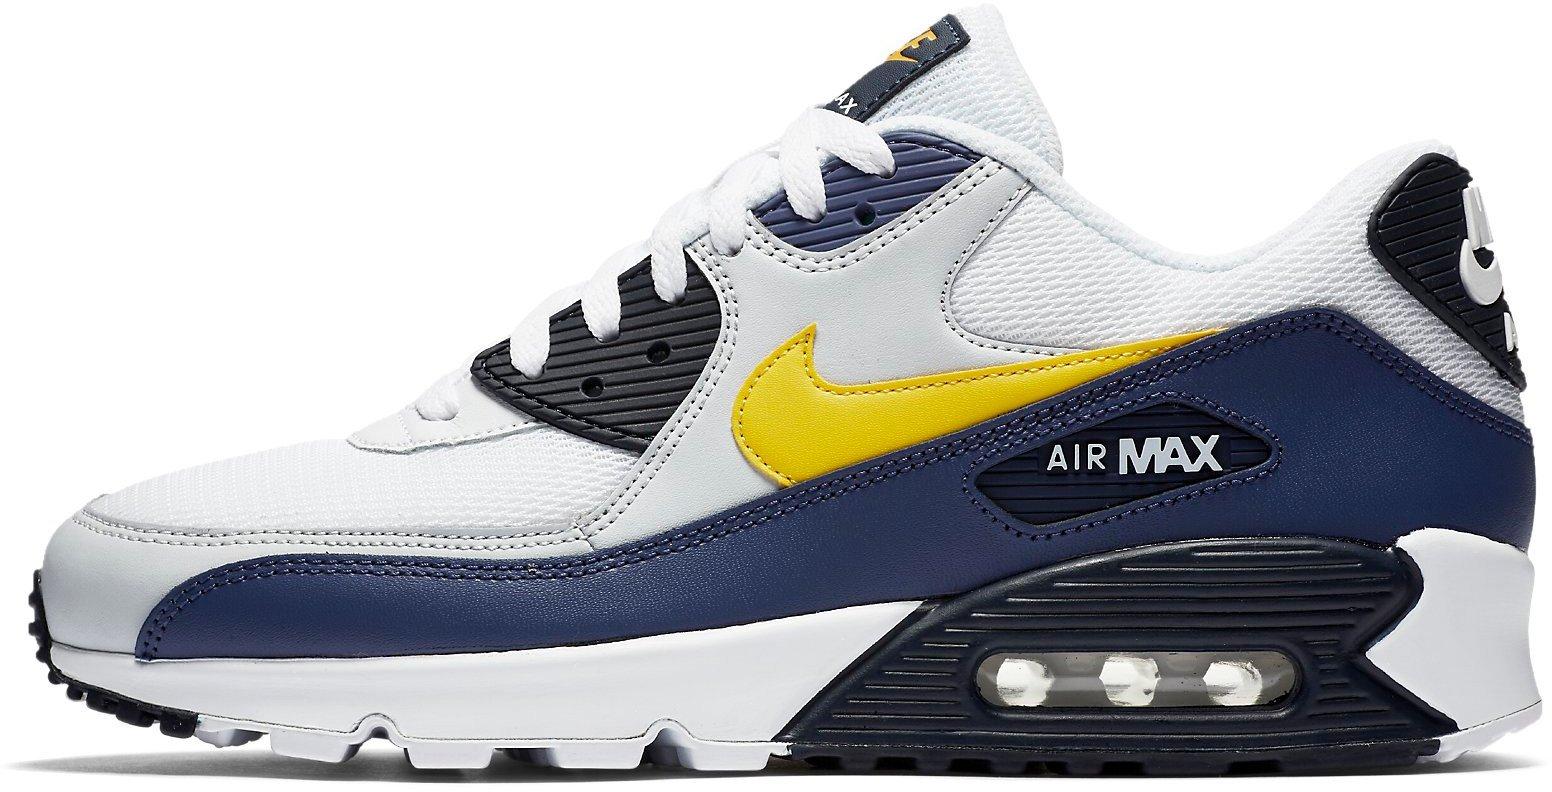 nett Schuhe Nike AIR MAX 90 ESSENTIAL billig UfZRSzaG phil